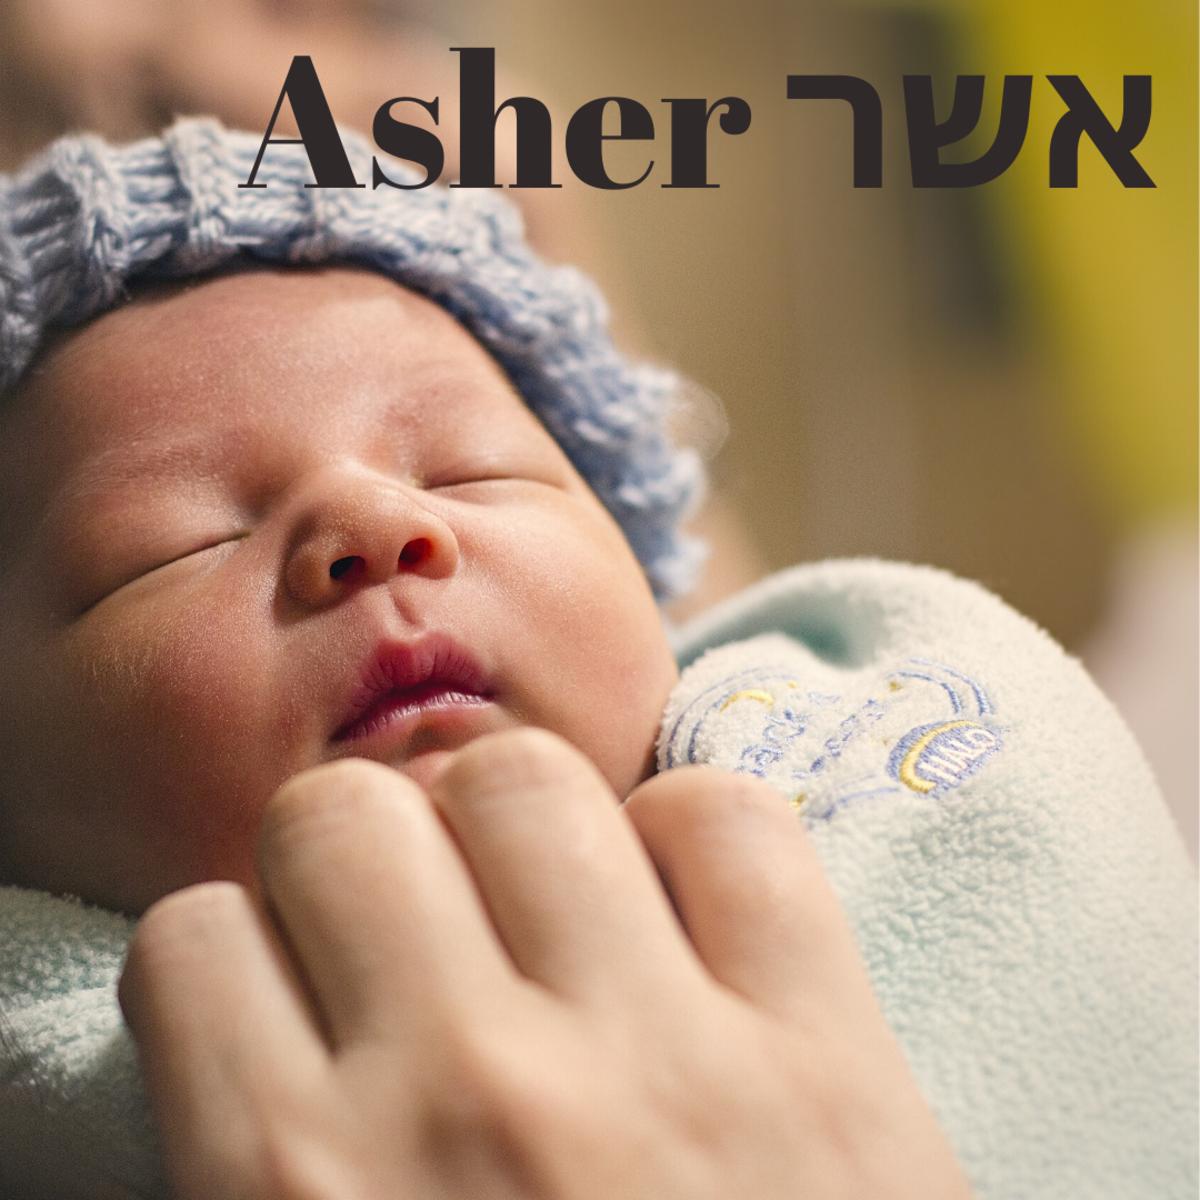 Asher אשר